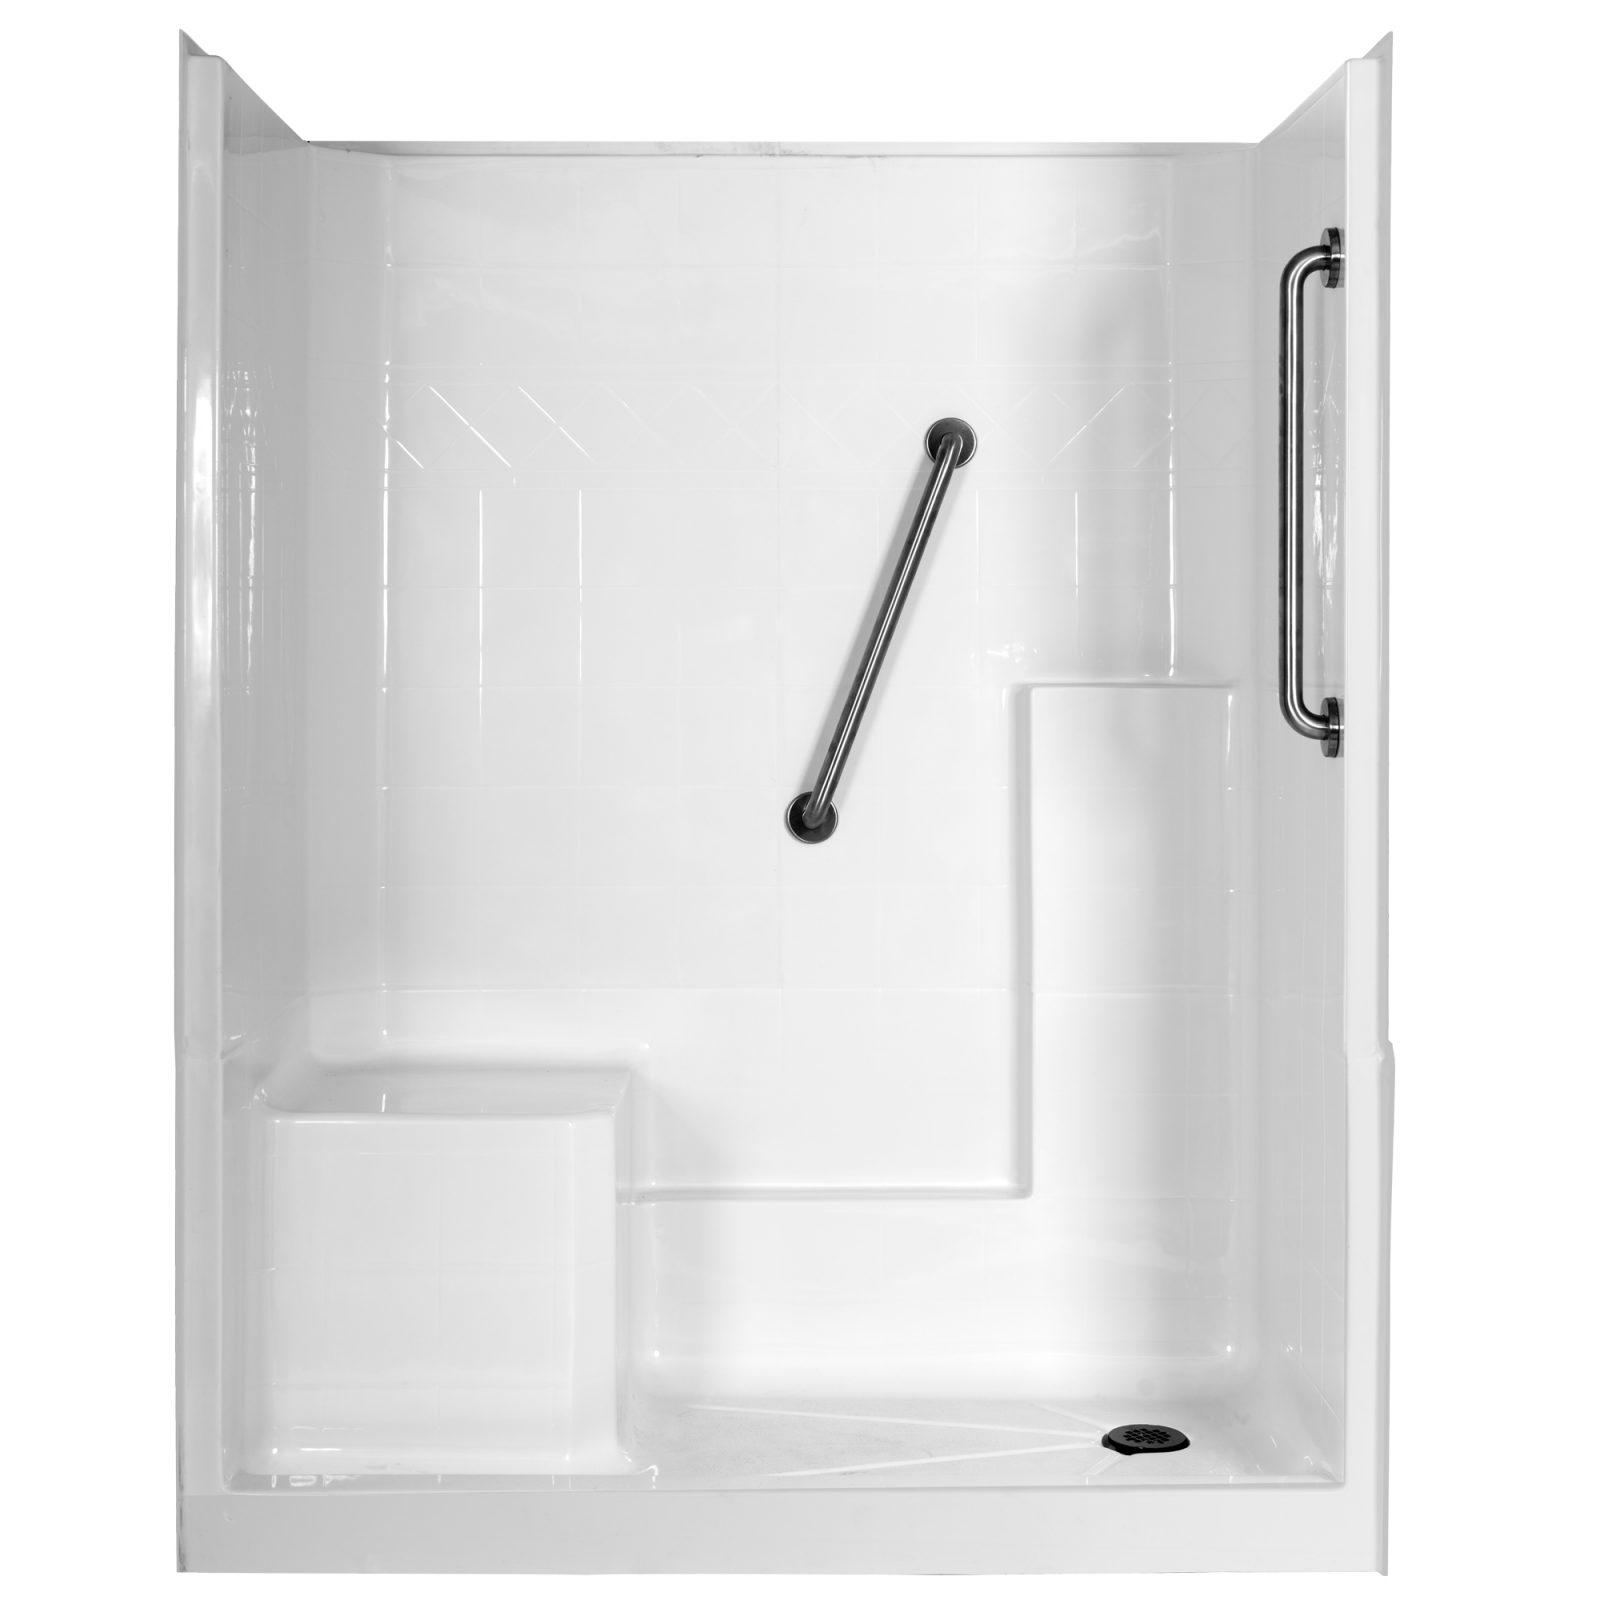 best offers on huron shower enclosures at homeward bath lt6023plw lt6023rw lt6023dl 1